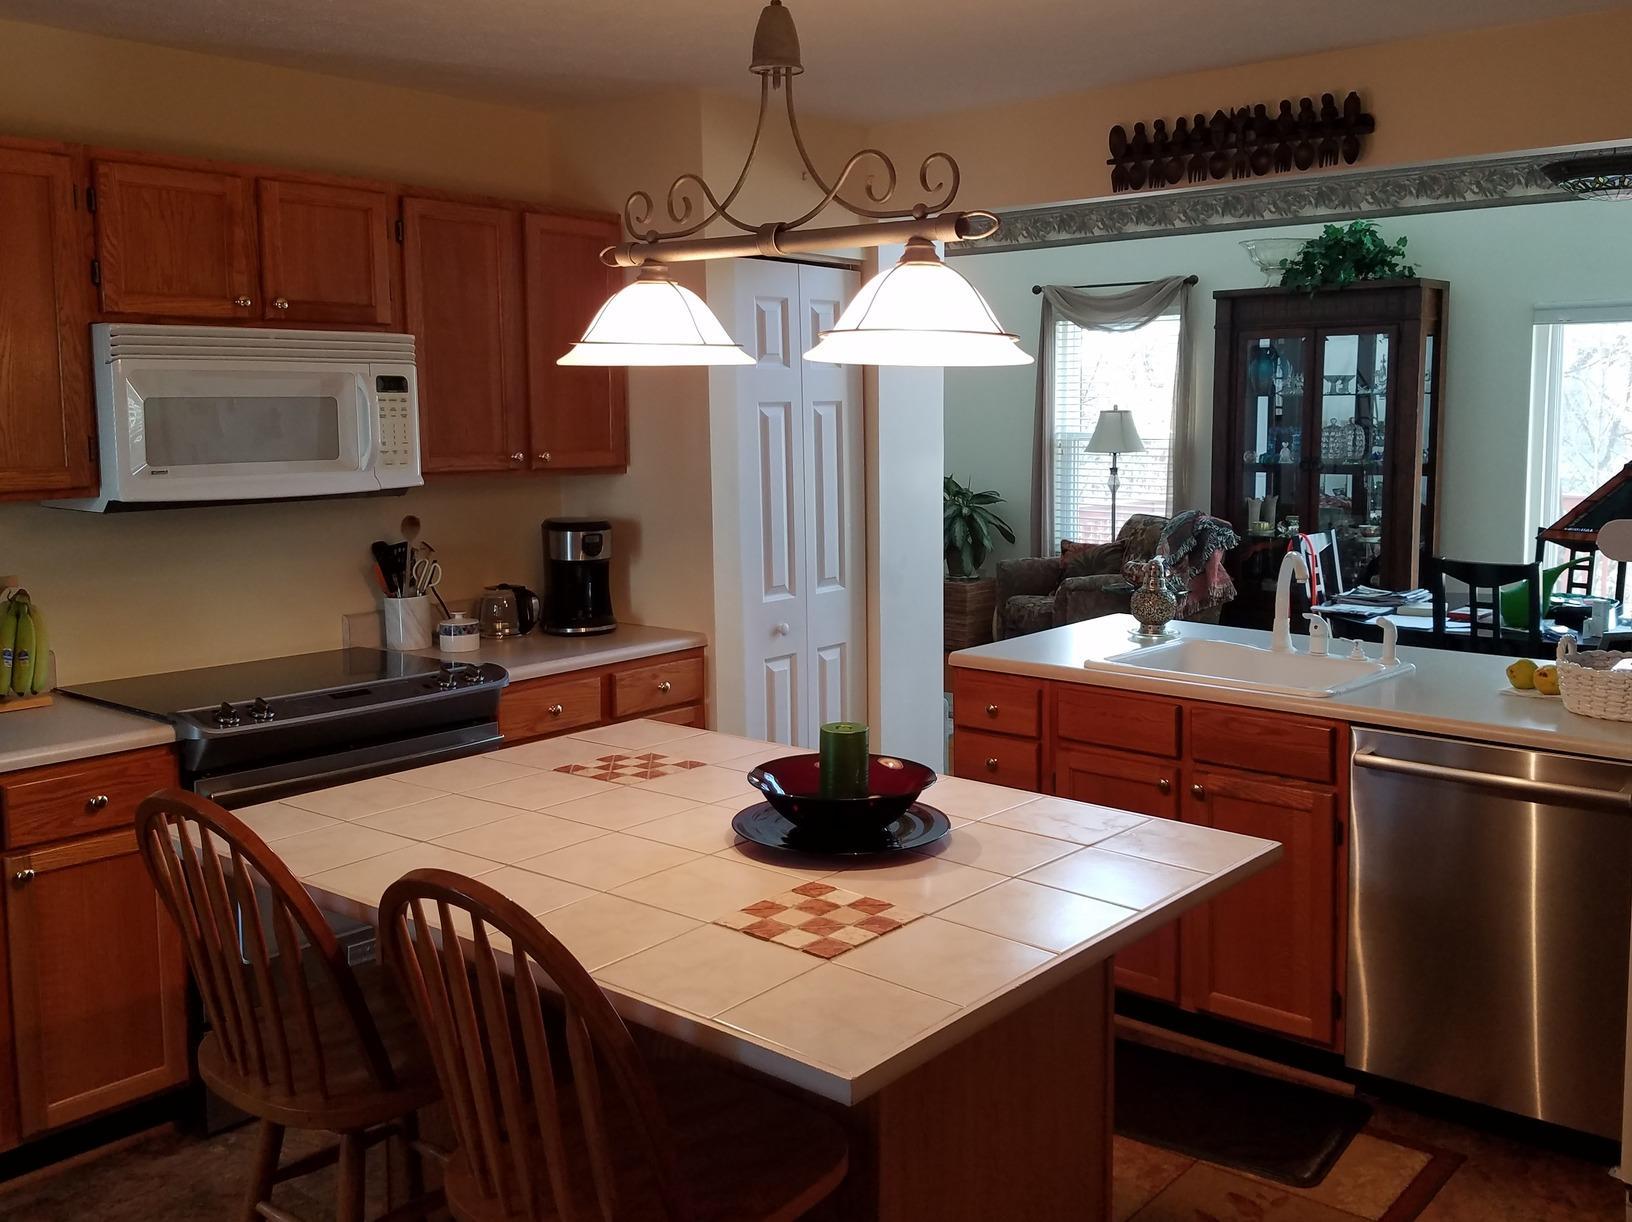 John H., Lawrence, PA - Kitchen Remodel - Before Photo